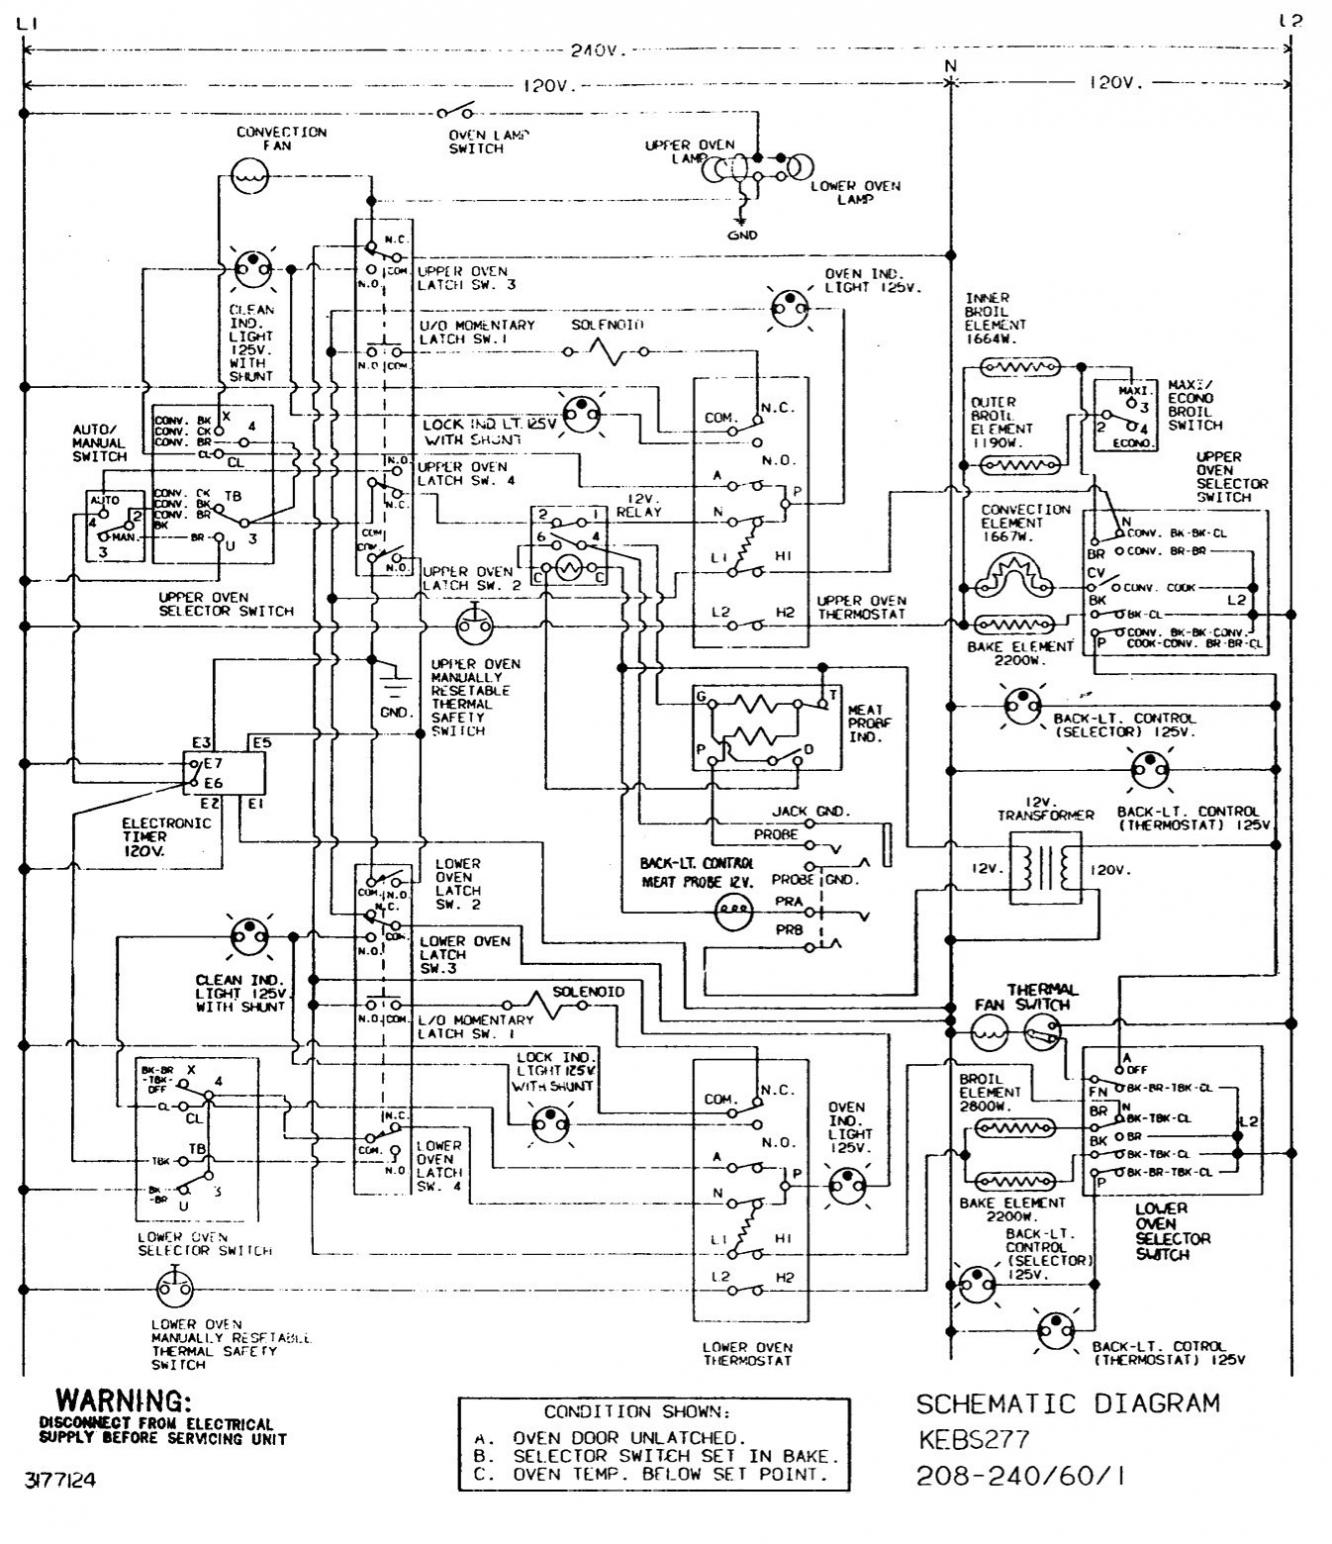 Ge Oven Wiring Diagram Jbp68hd1cc - Drac Wiring Diagram -  air-bag.tukune.jeanjaures37.fr   Ge Oven Wiring Diagram Jbp68hd1cc      Wiring Diagram Resource